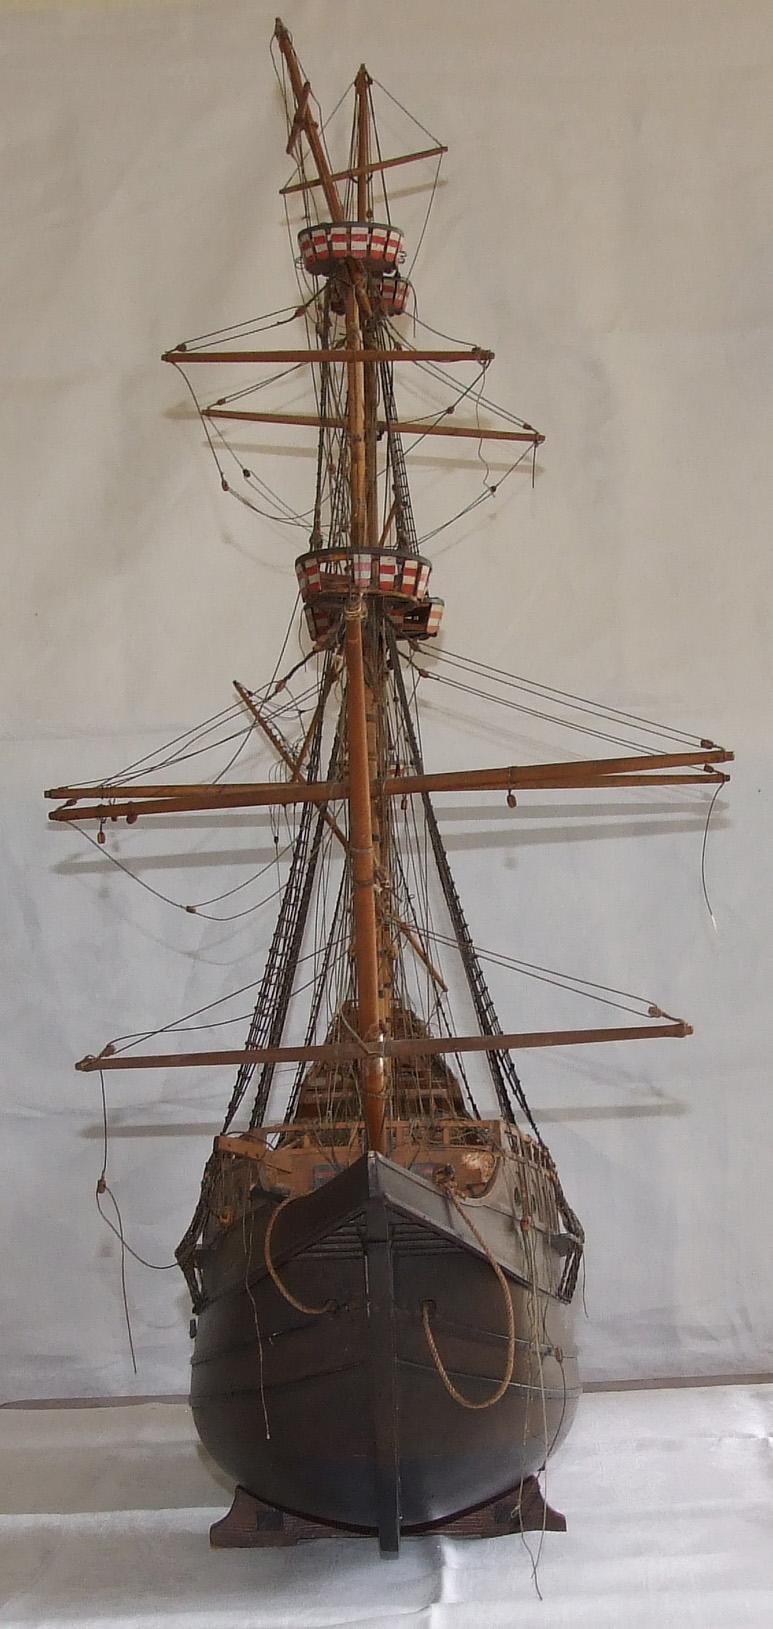 Elizabethan Galleon model unrestored. Restored Galleon